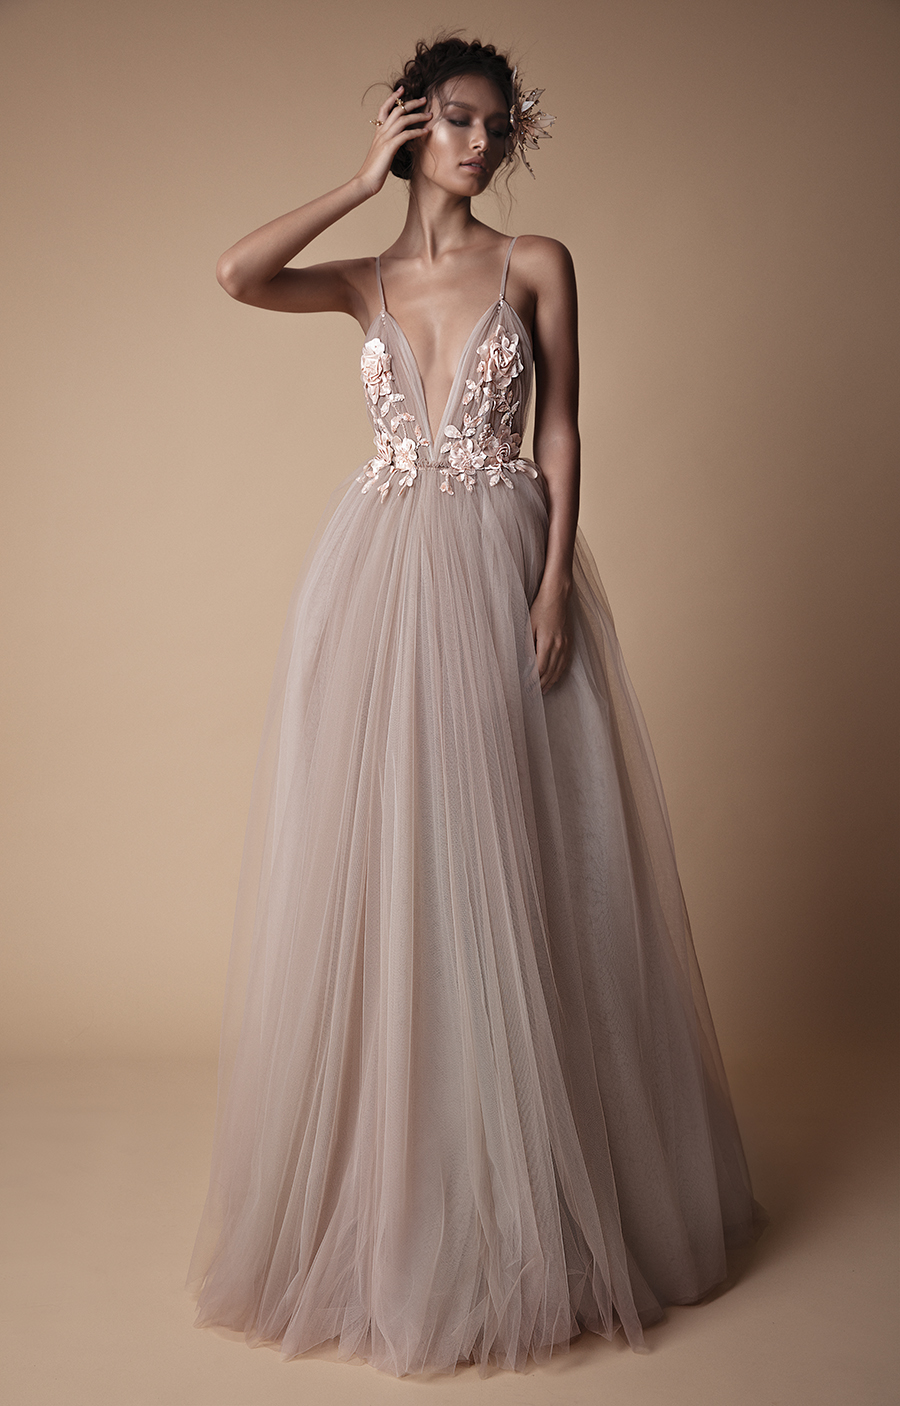 berta bridal wedding dresses photo - 1